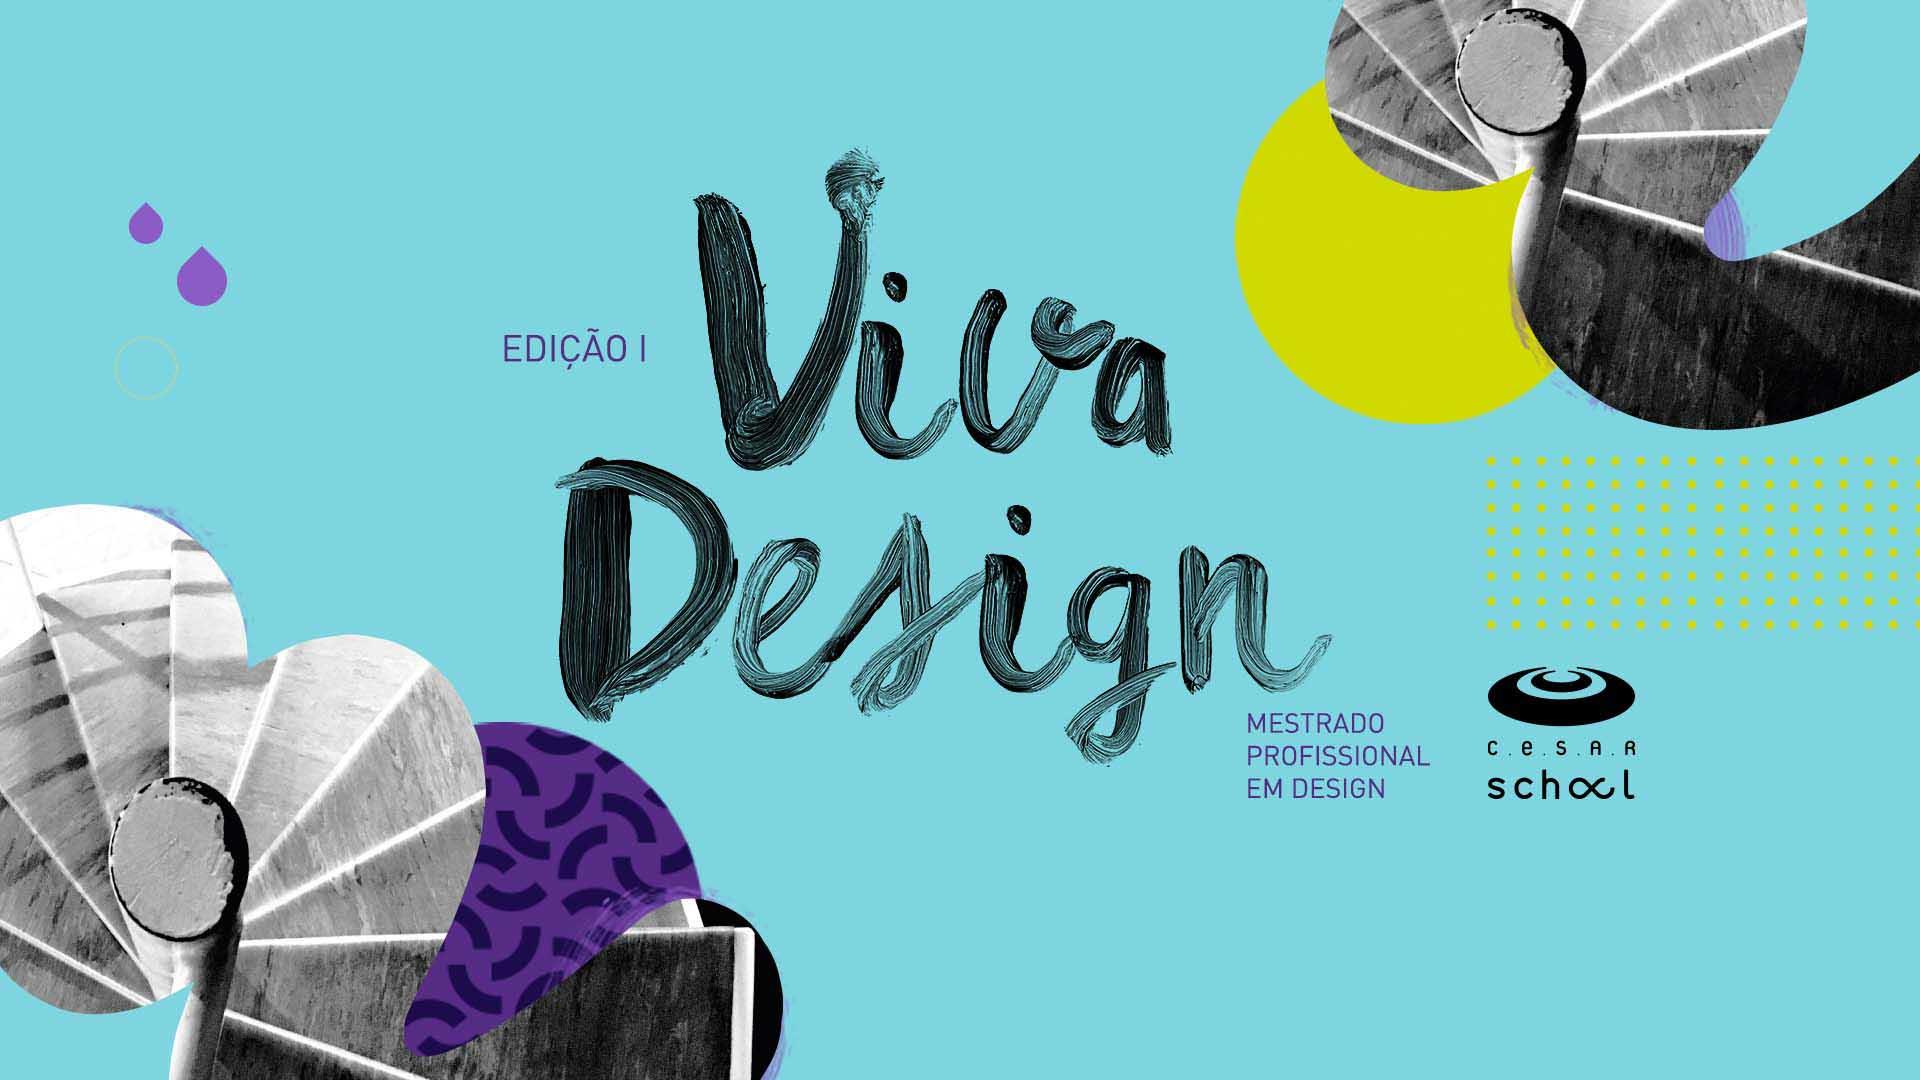 CESAR School abre portas para discutir Design